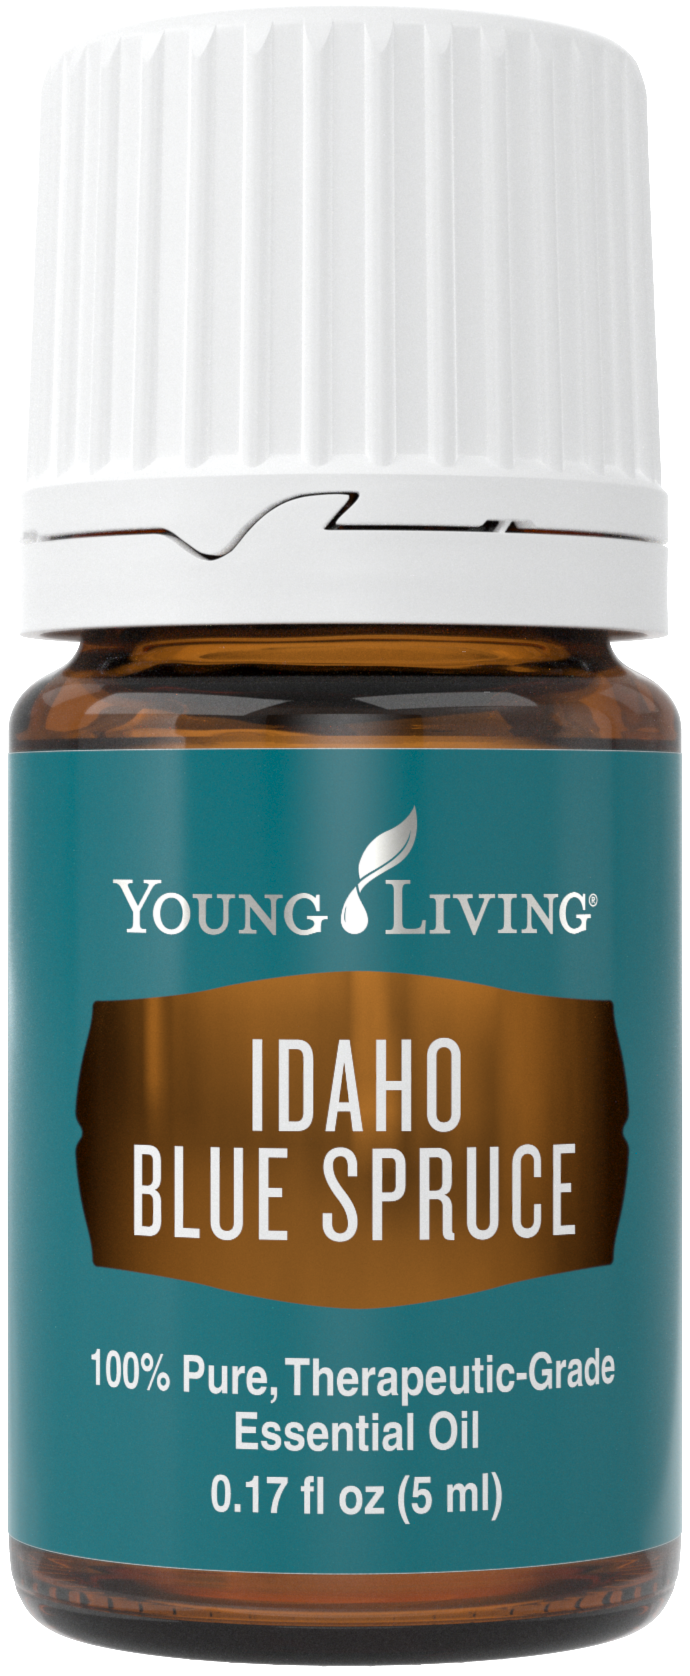 Idaho Blue Spruce.png